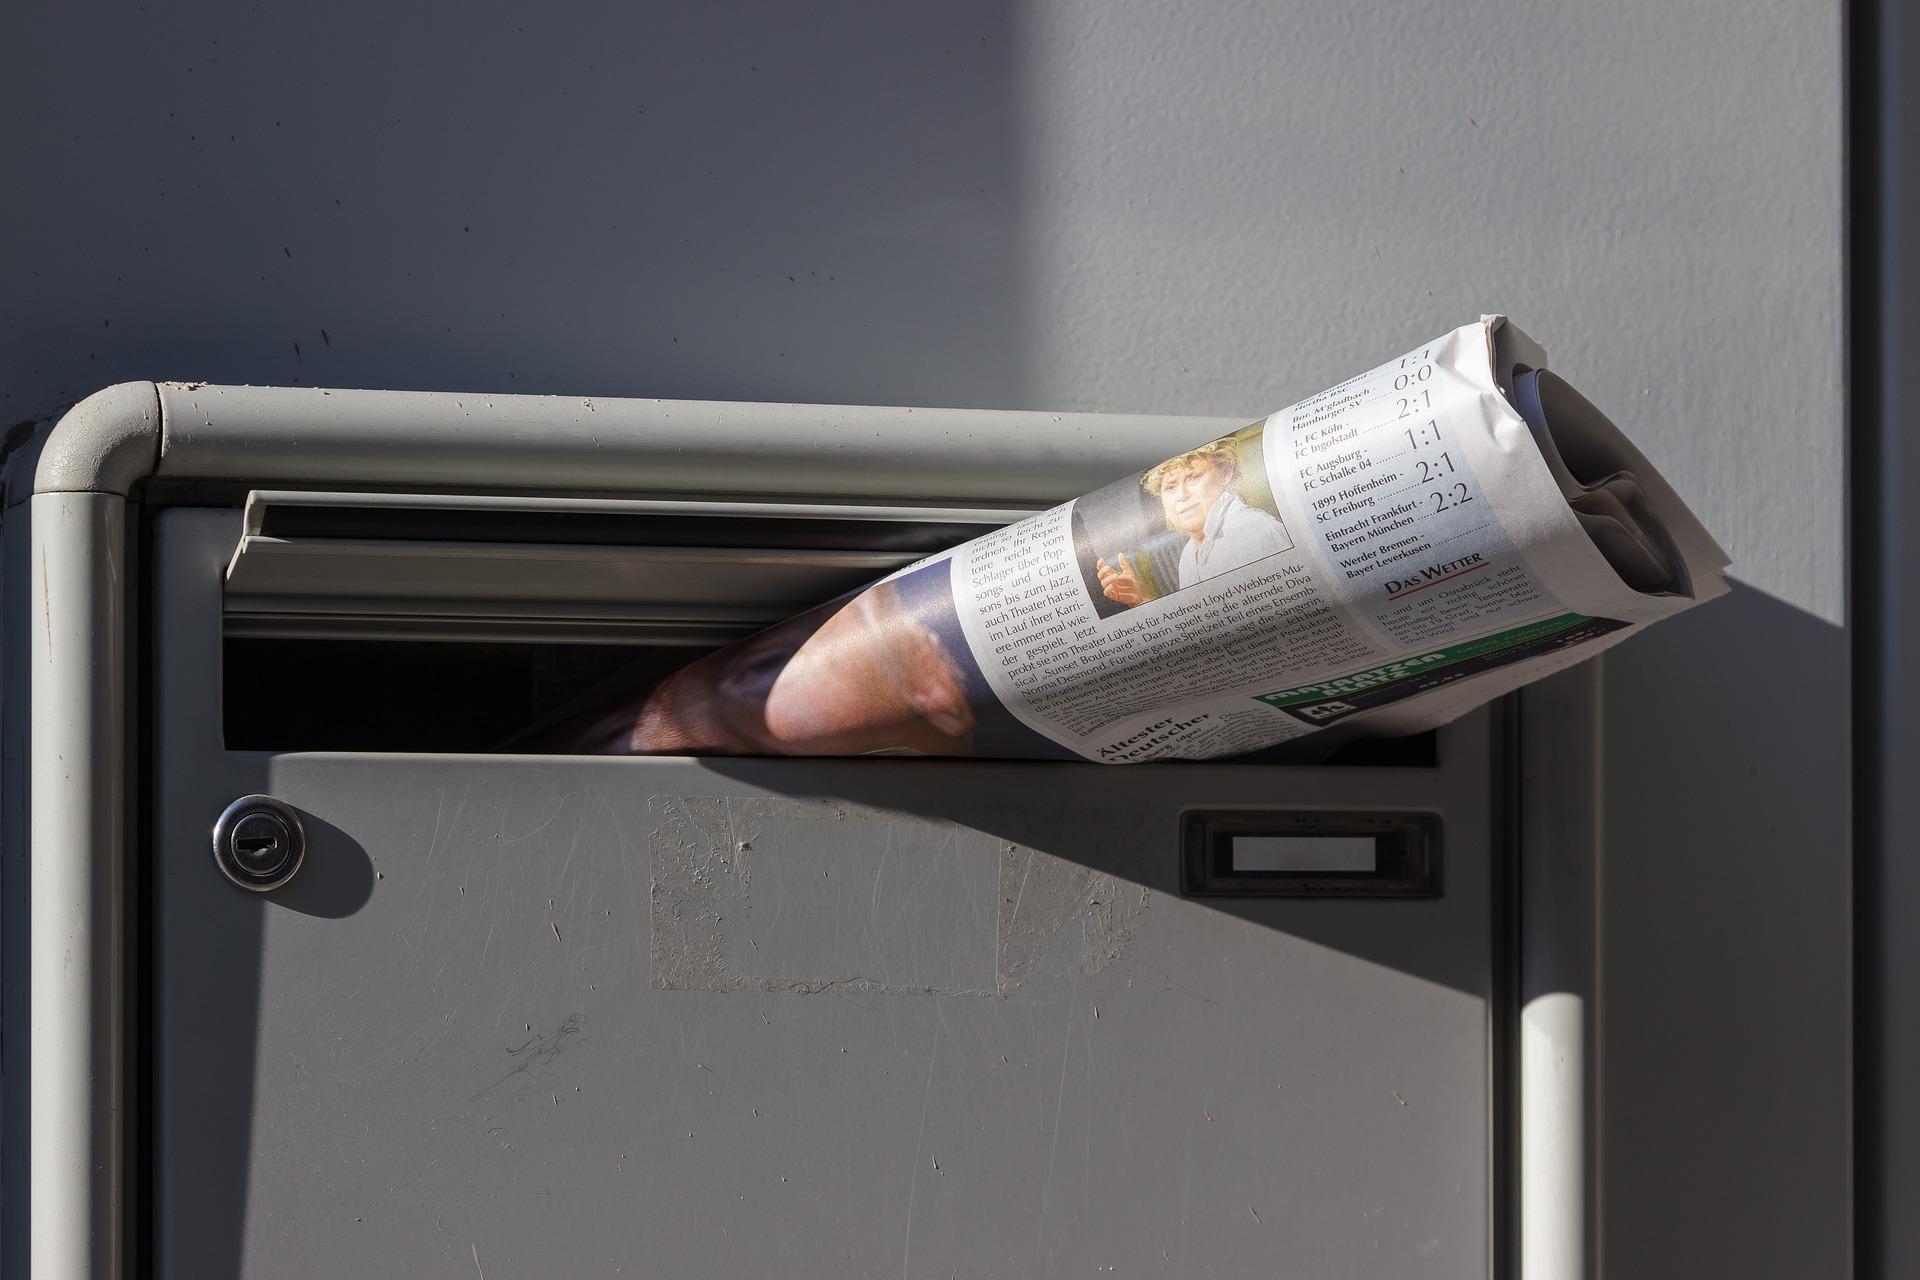 Newspaper editor